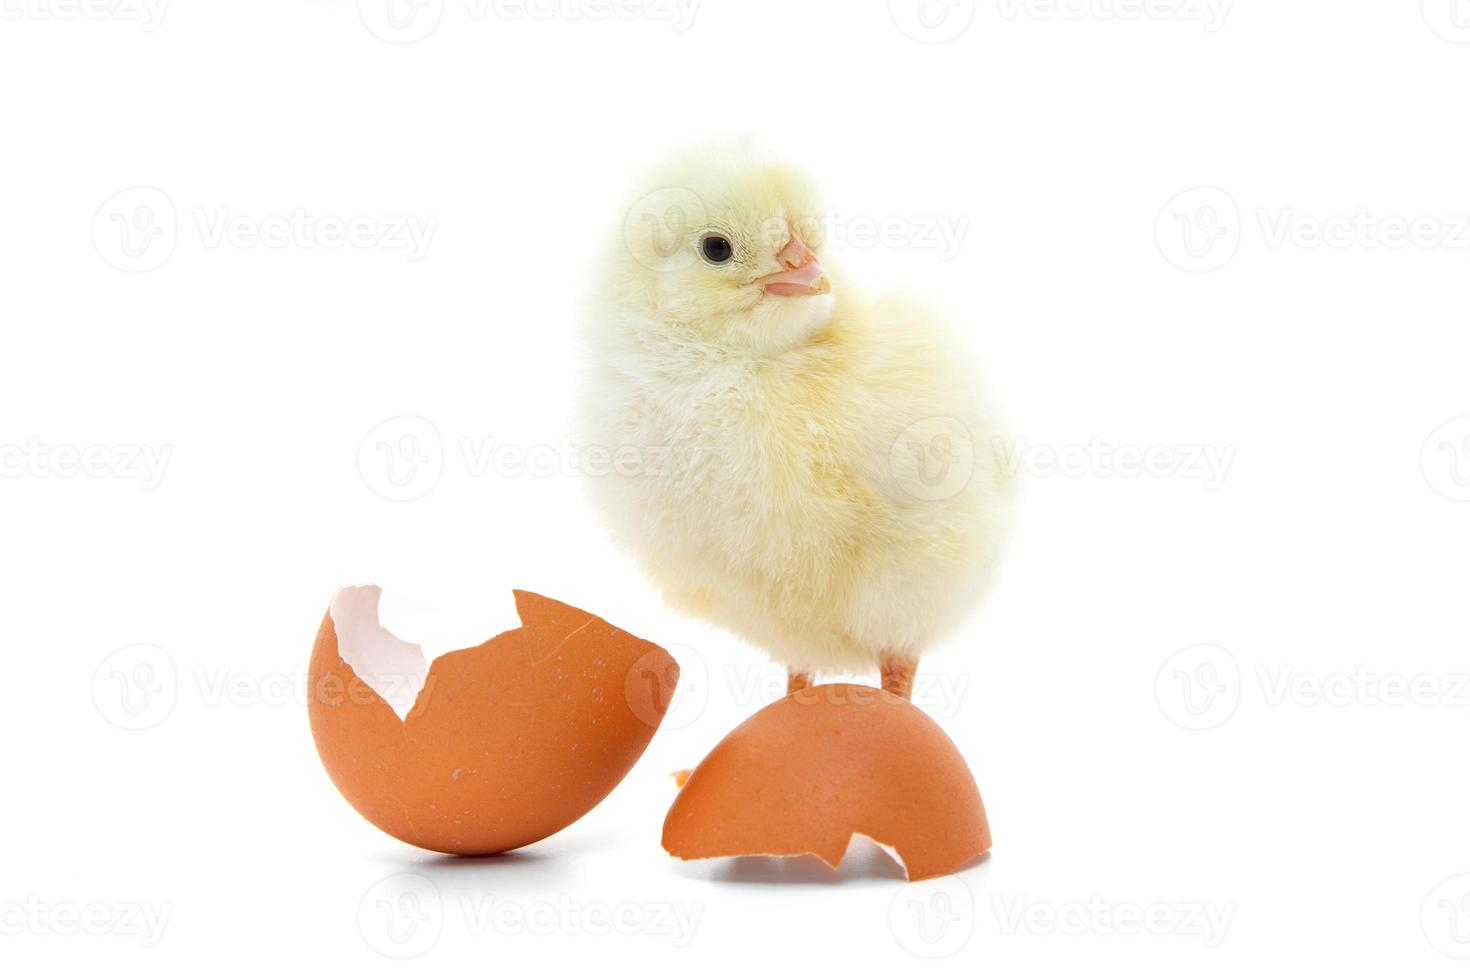 Cute little chick photo